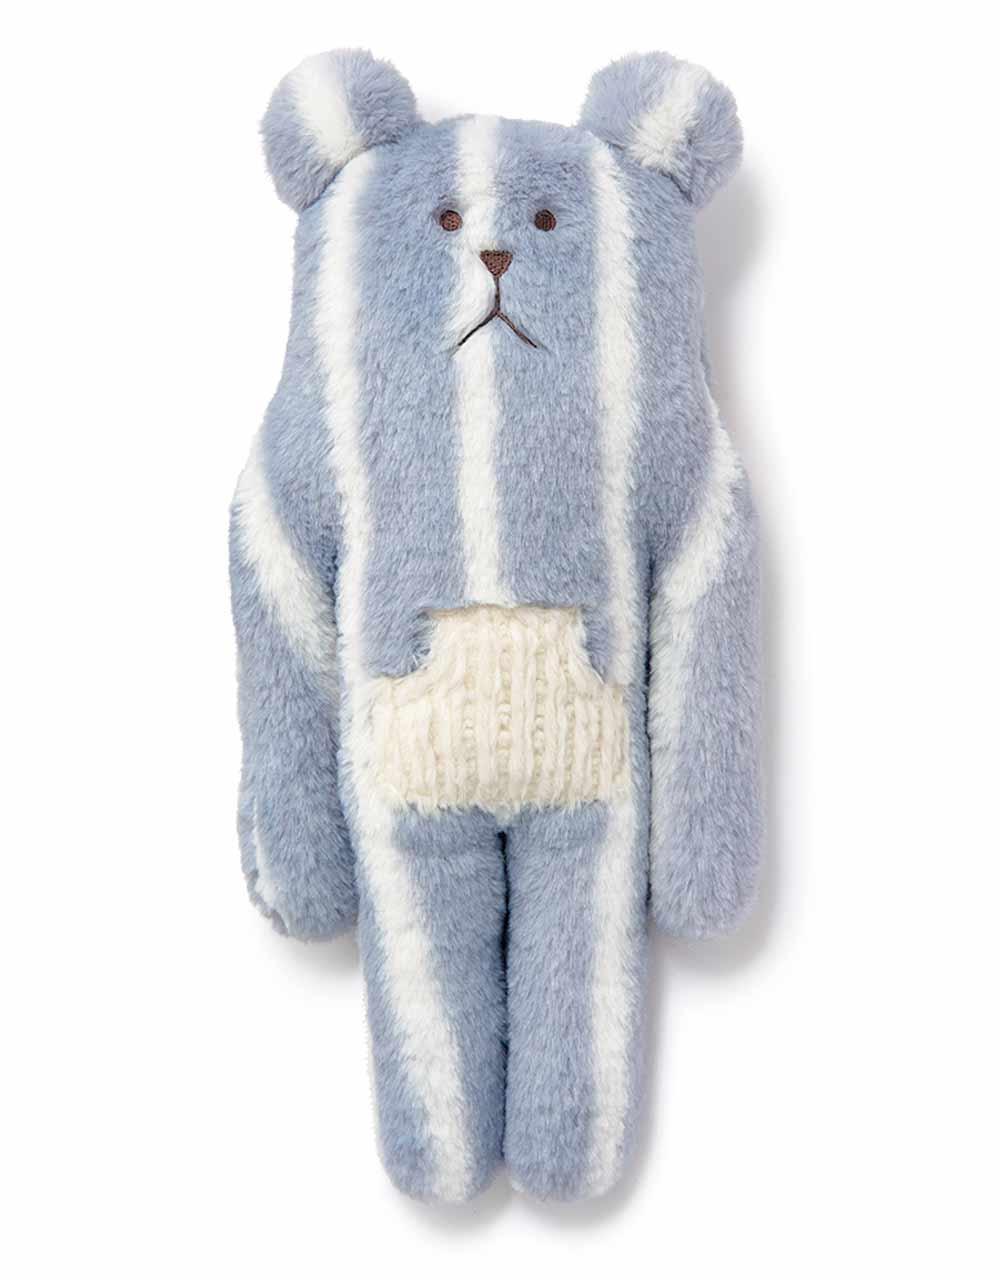 Мягкая игрушка Craftholic медведь French STRIPE SLOTH, S